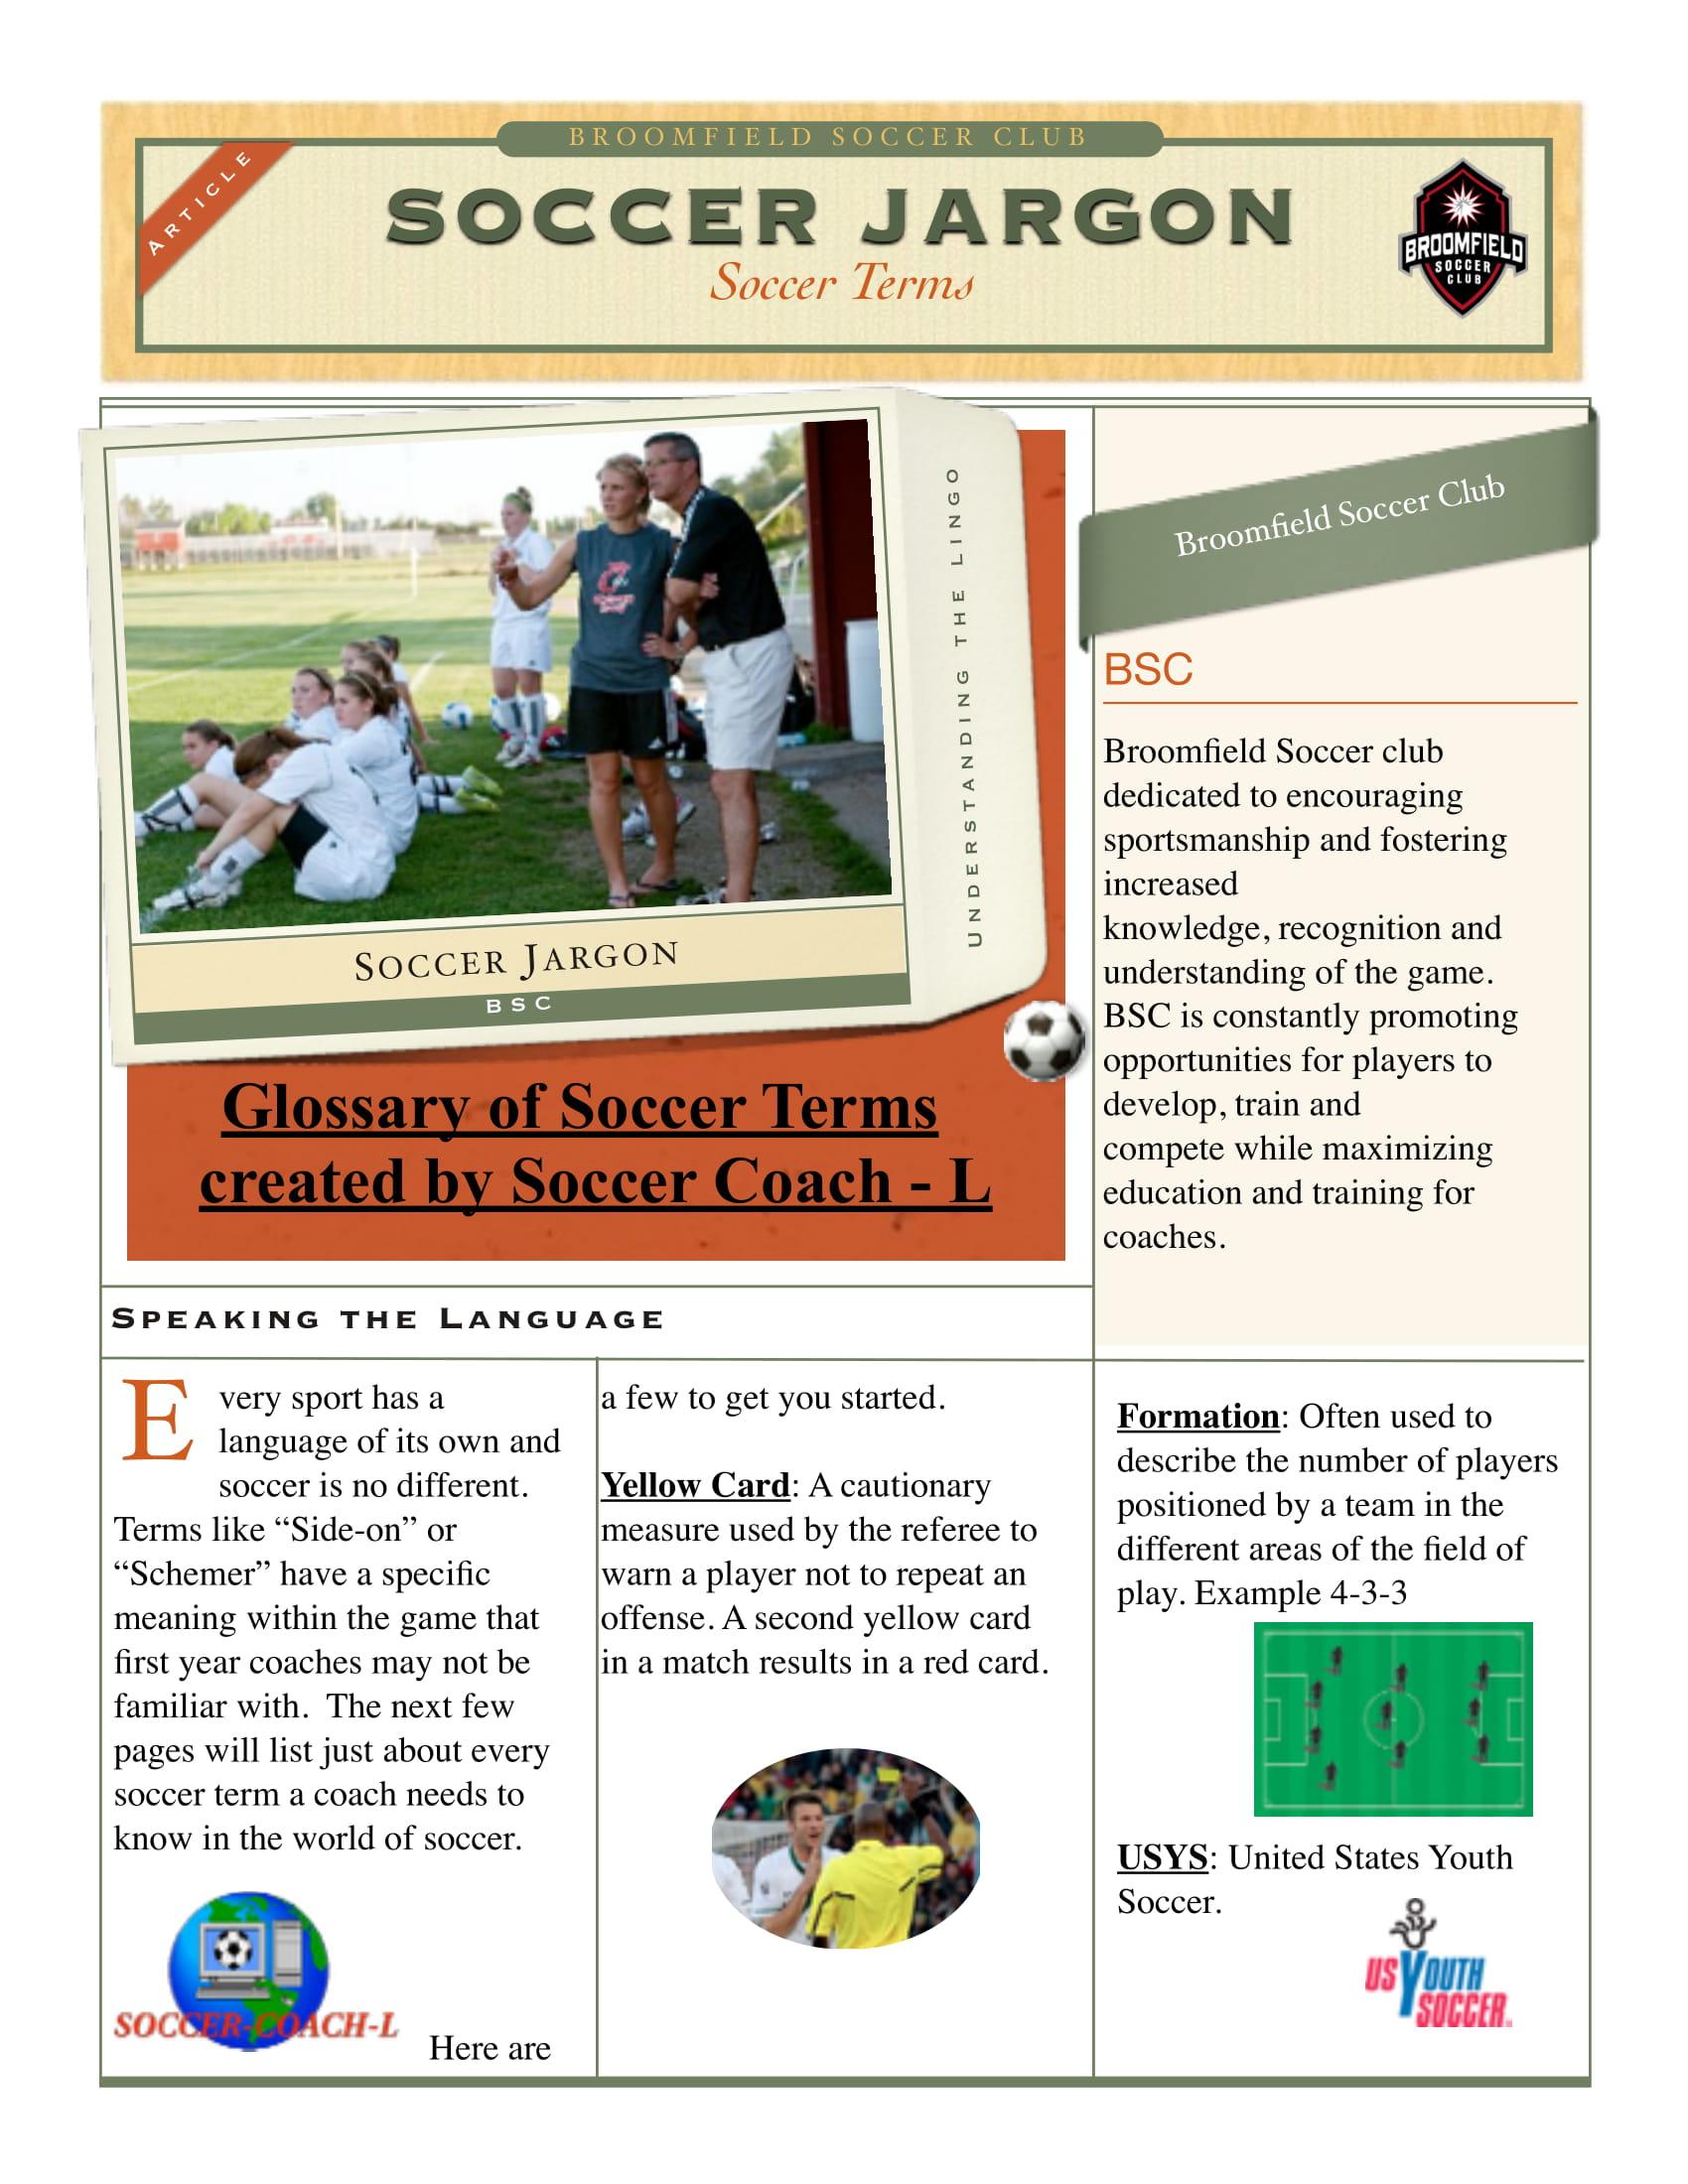 soccer jargon example